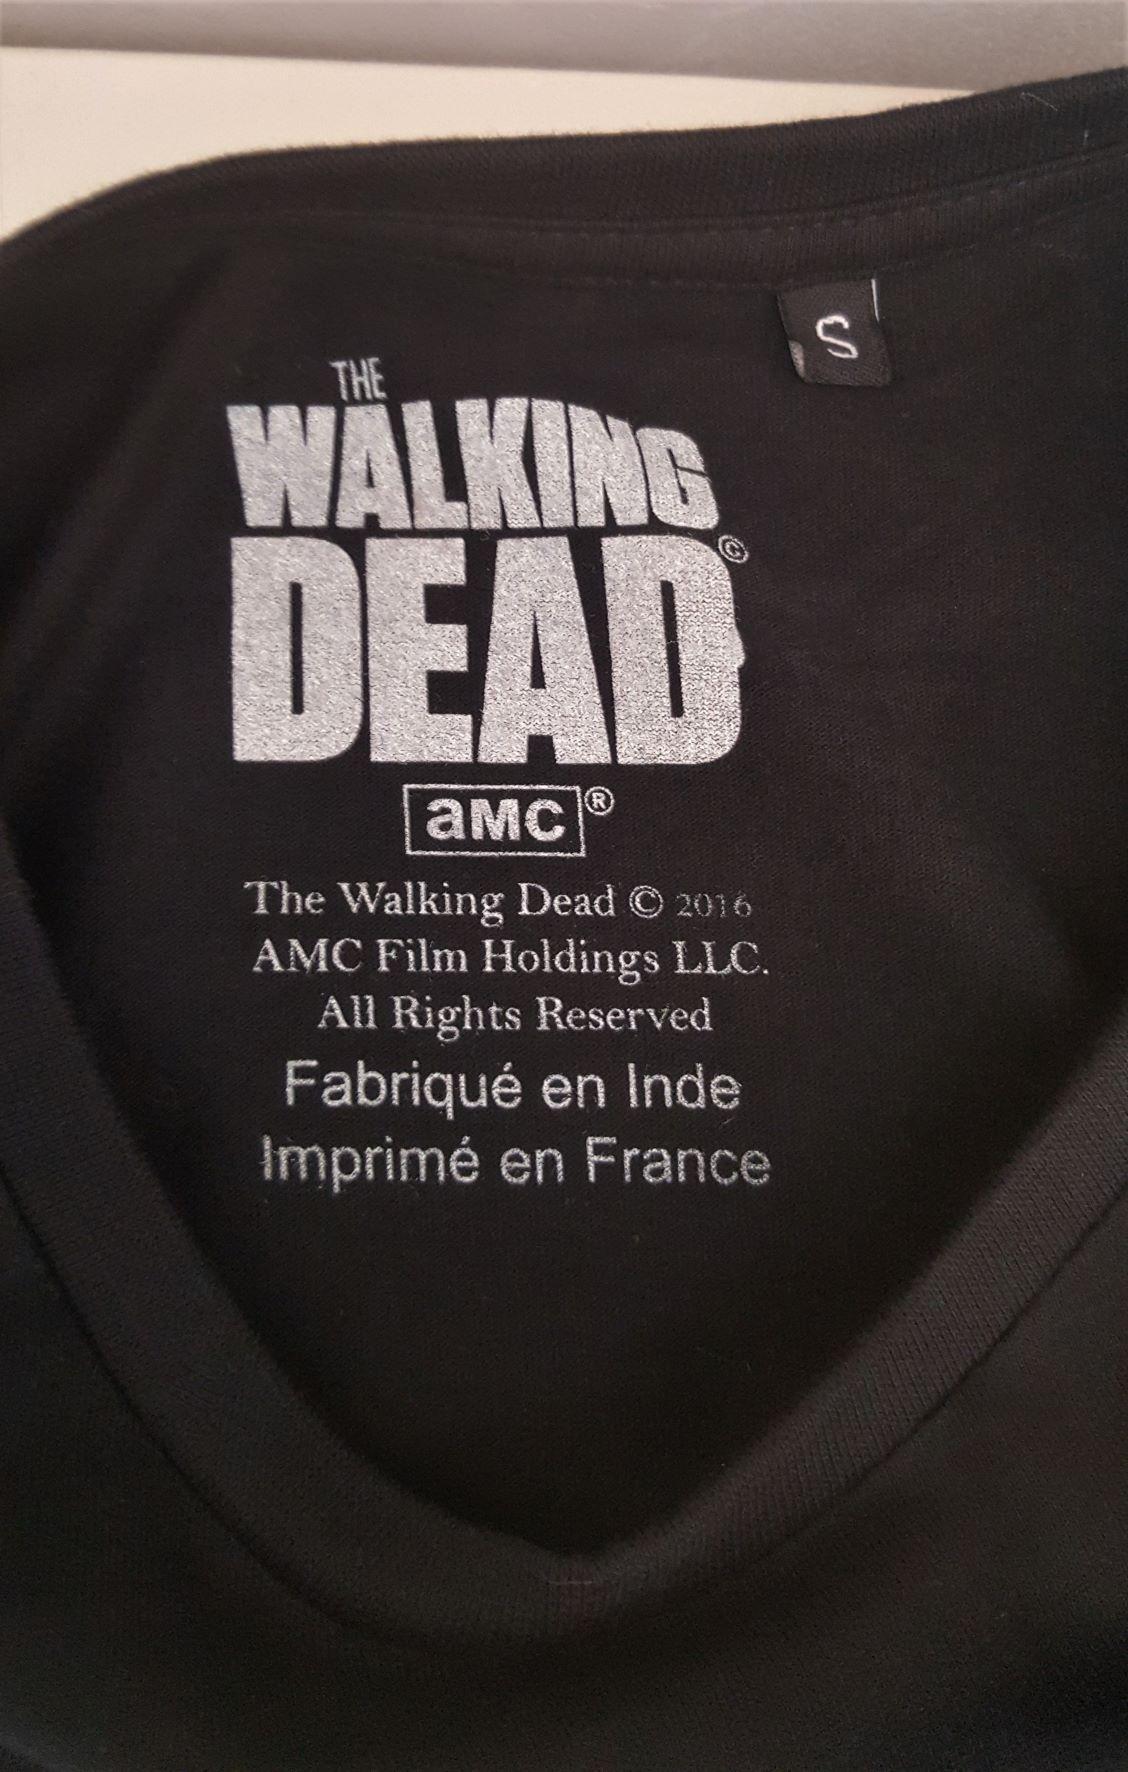 Tshirt walking dead 2